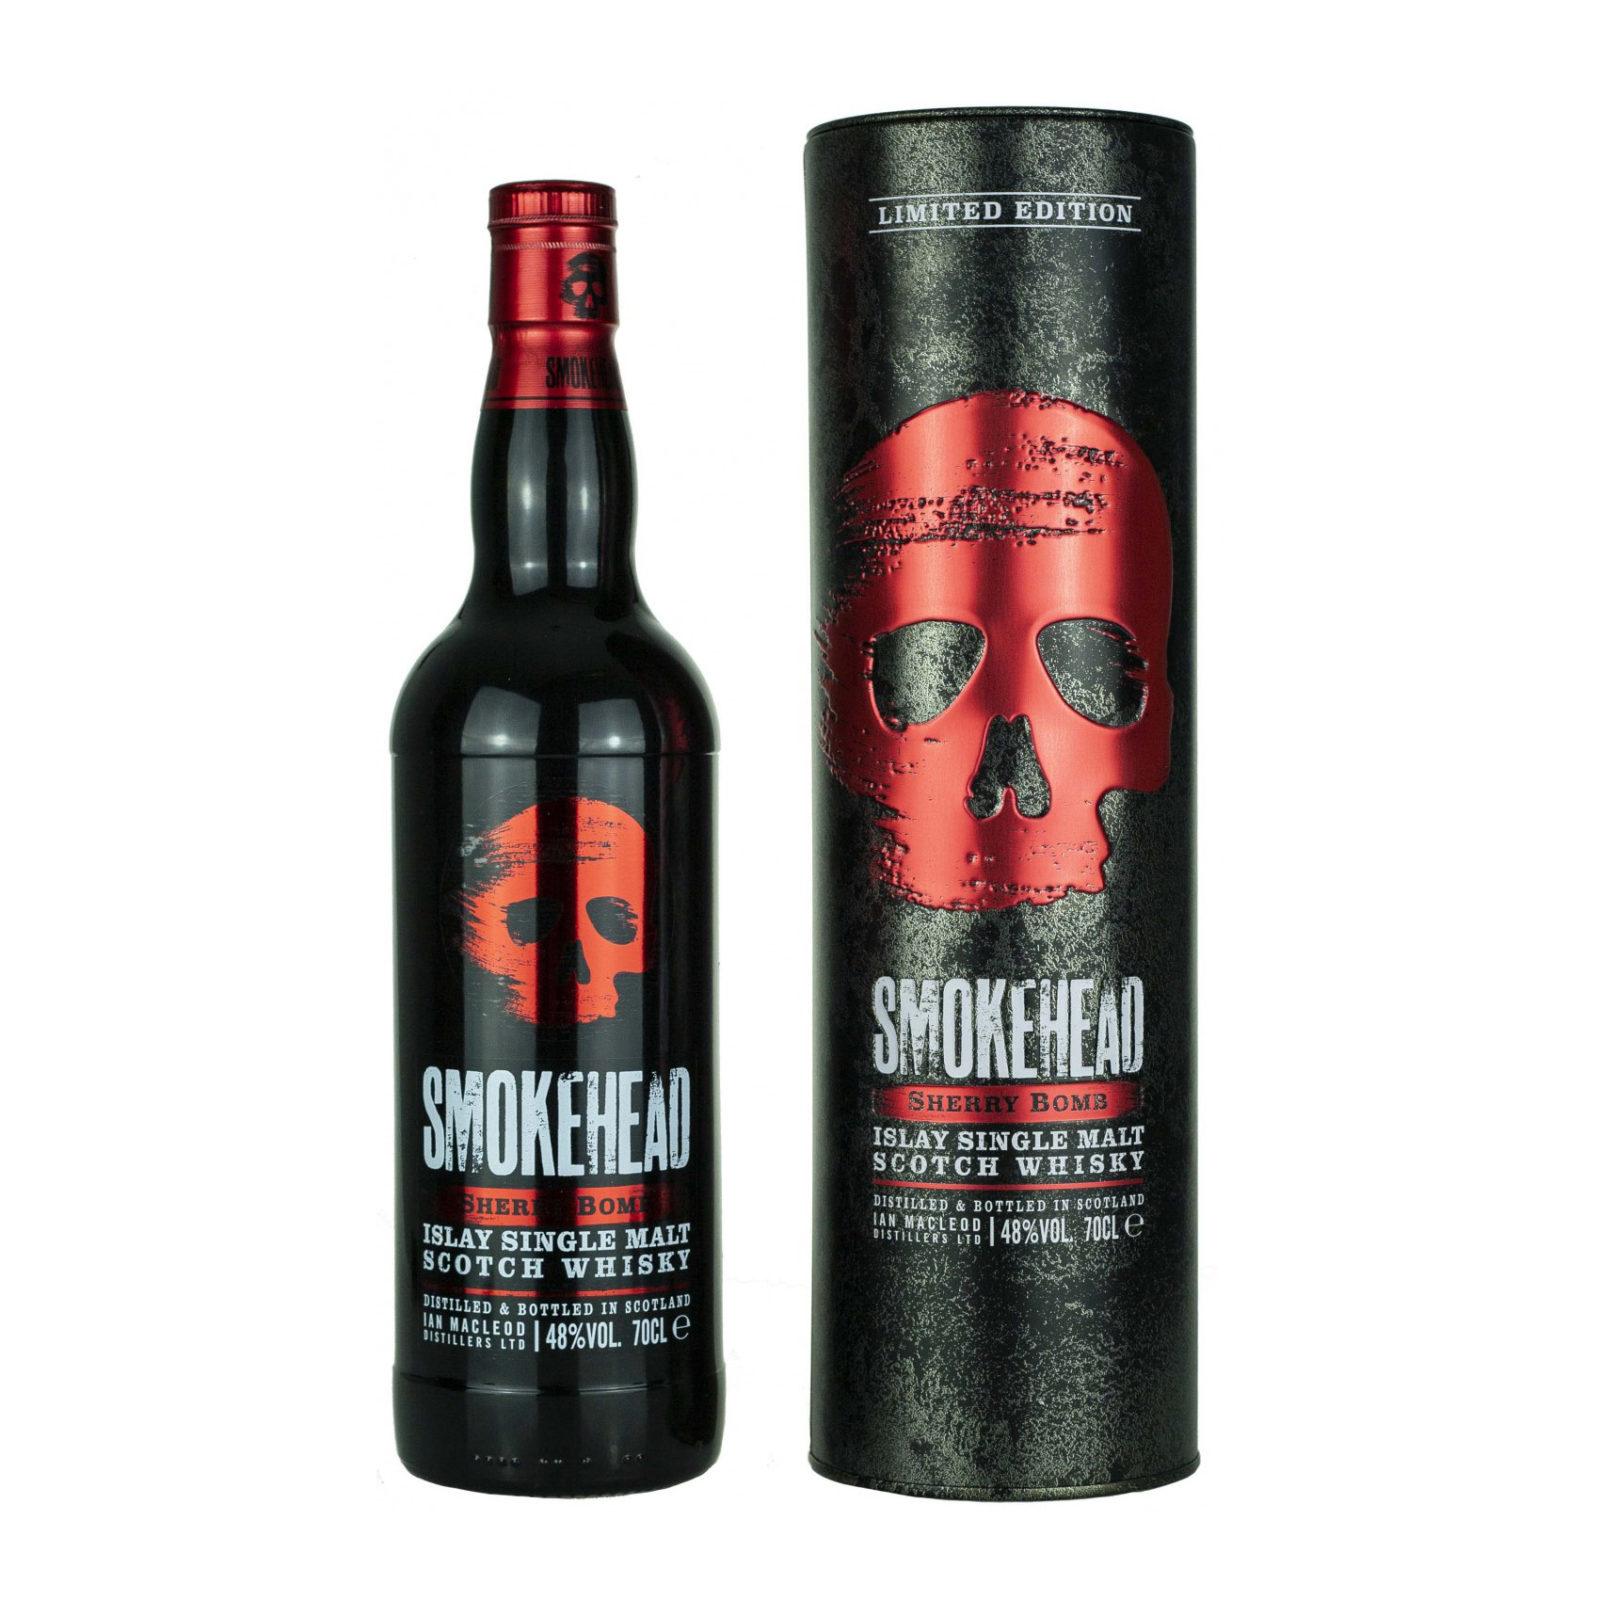 Smokehead Sherry Bomb Scotch Whisky New 2018 Release